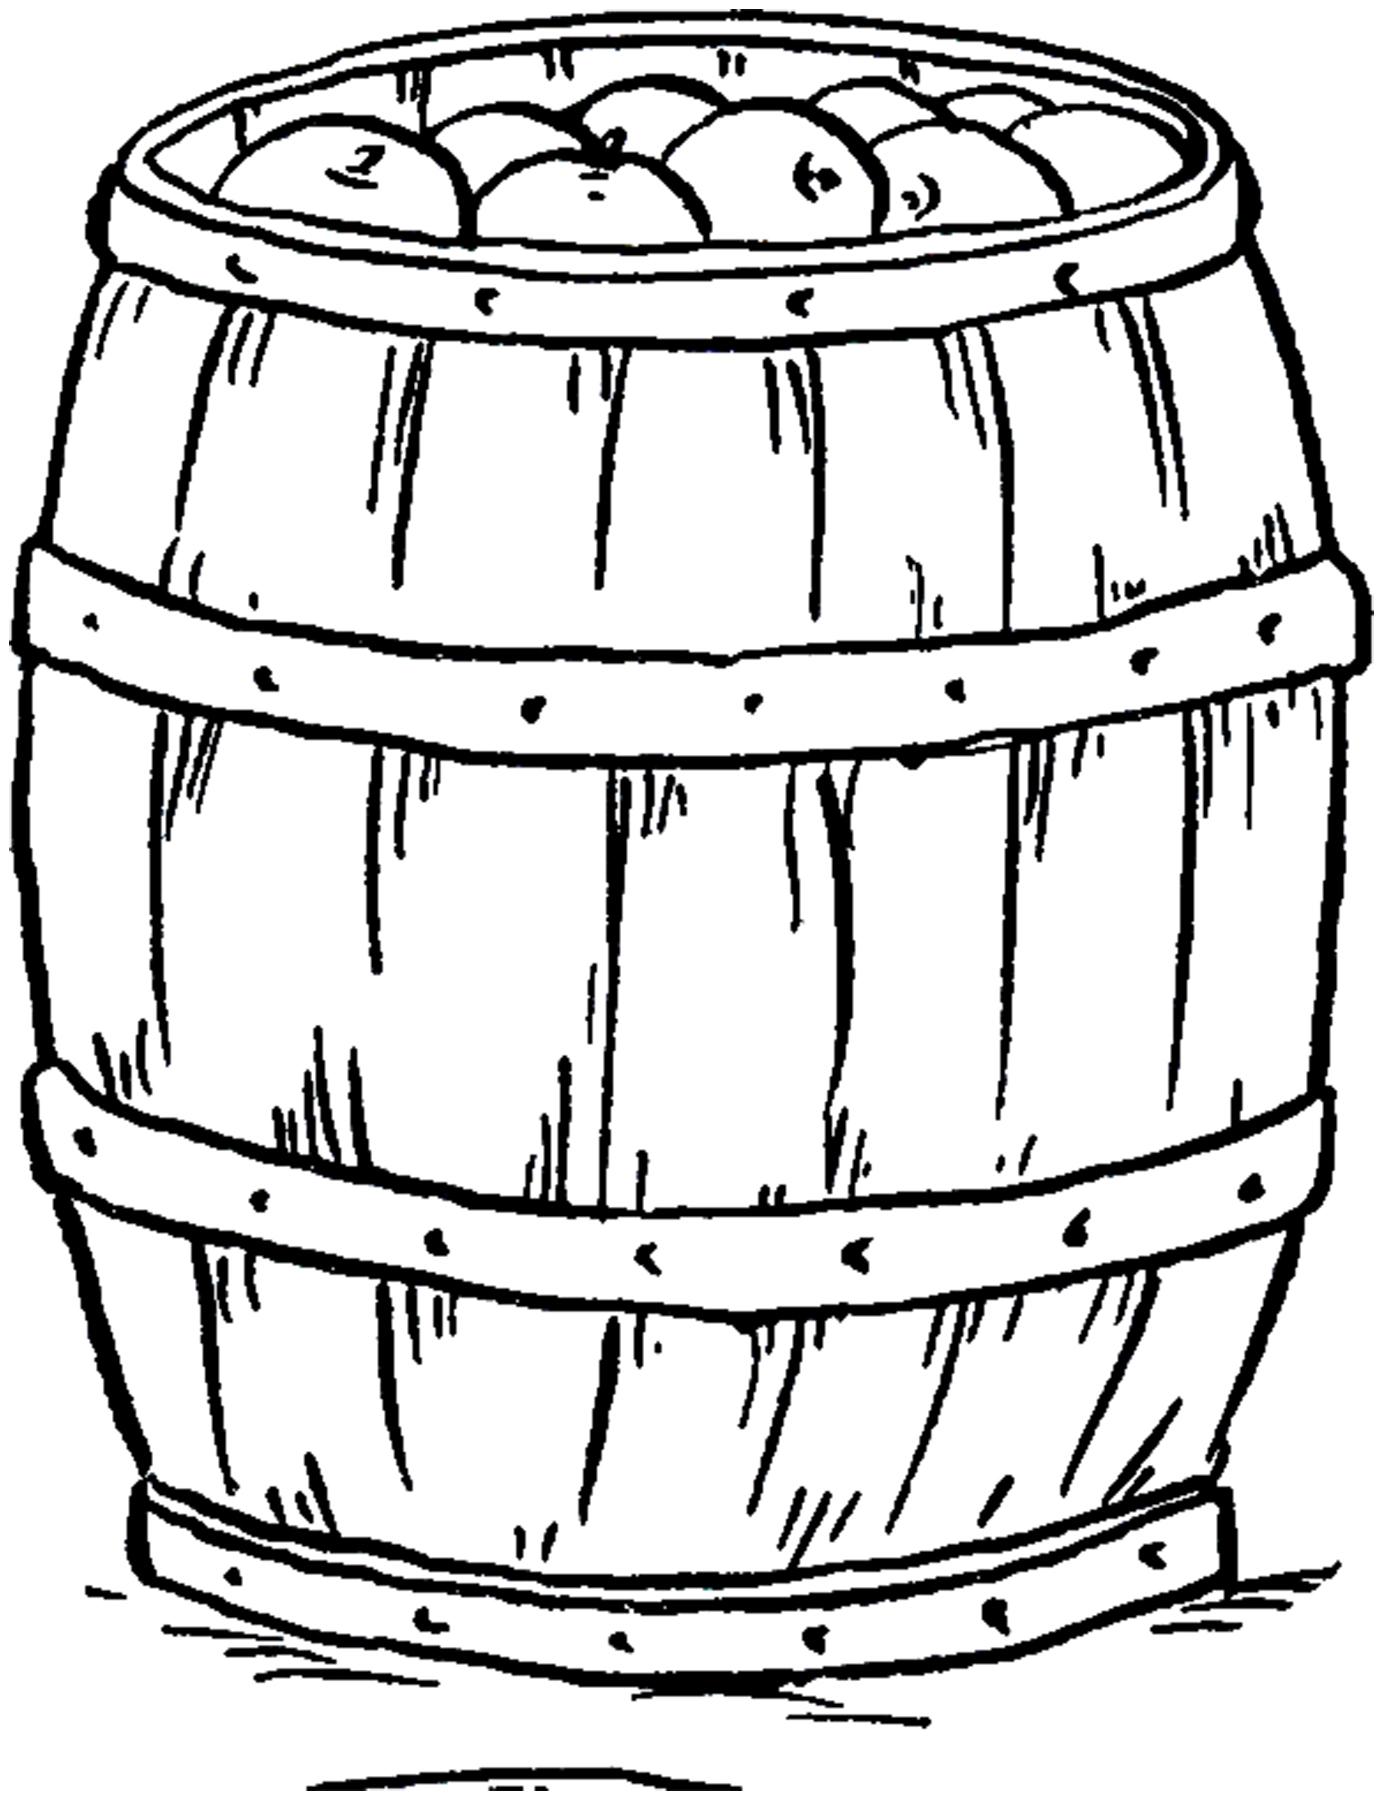 Apple barrel image the. Apples clipart vintage